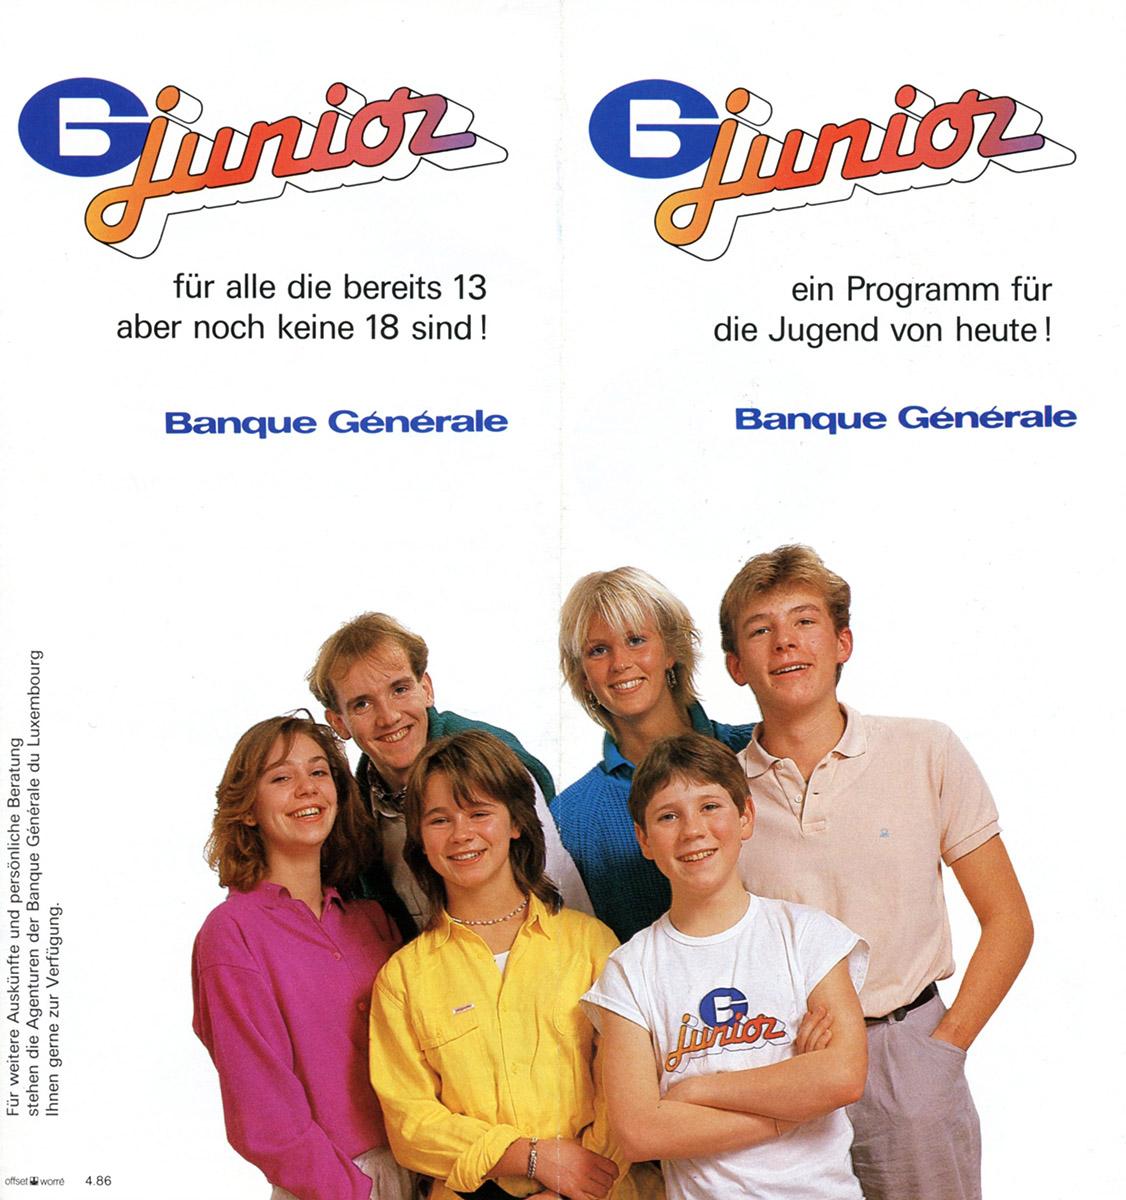 Dépliant BGL-junior 1991 Lex & Pit Weyer